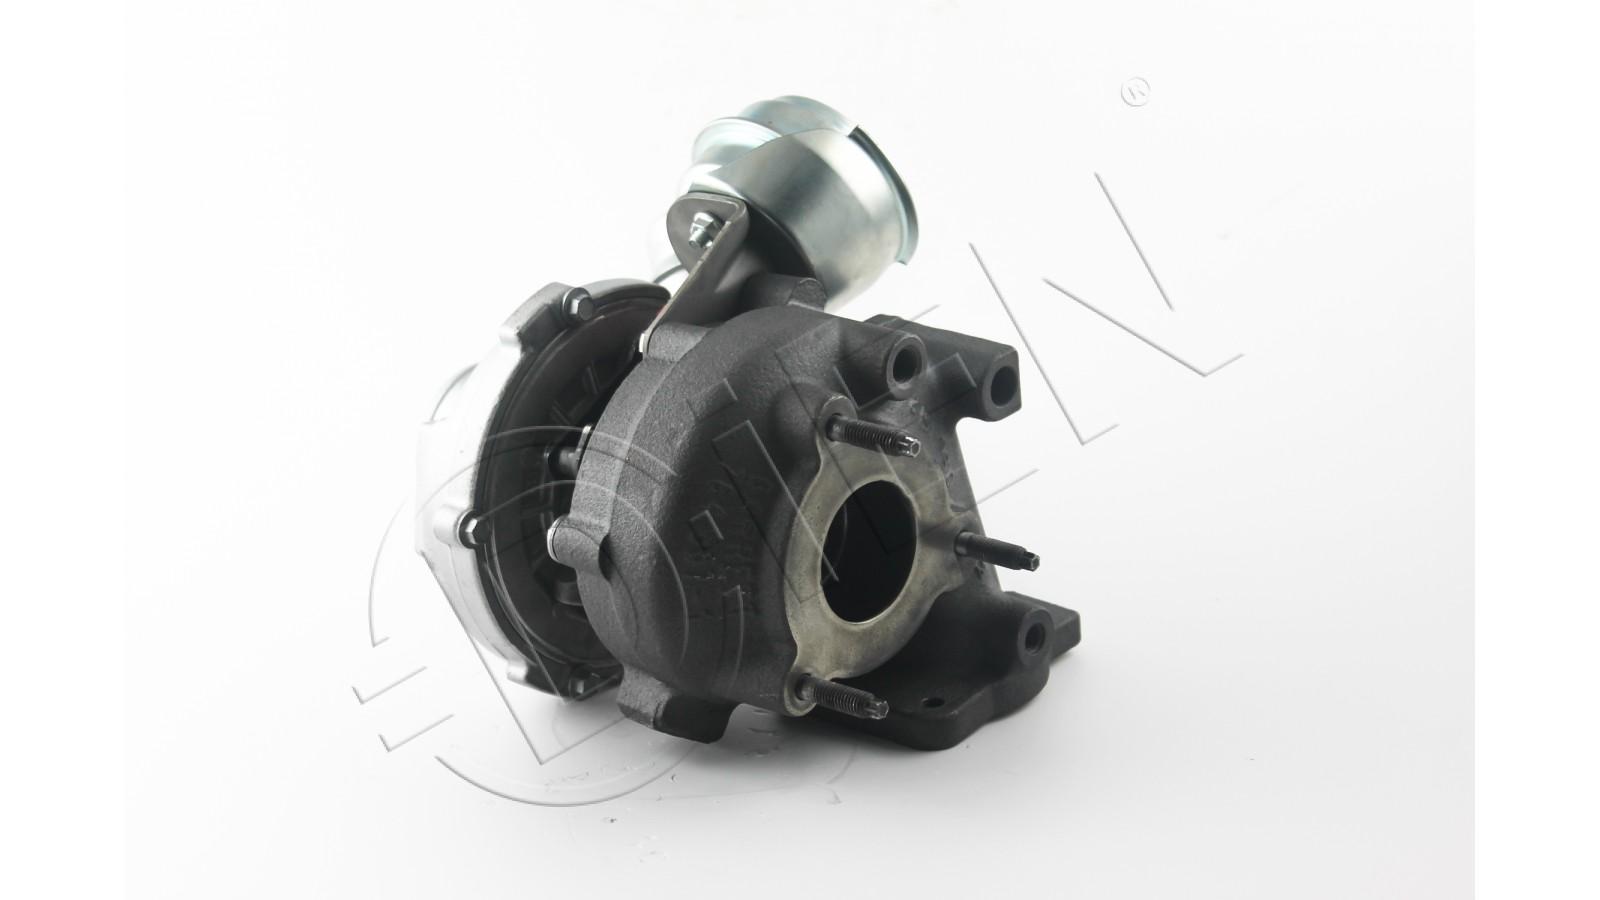 Turbocompressore rigenerato per RENAULT LAGUNA III Sportour 2.0 dCi 150Cv